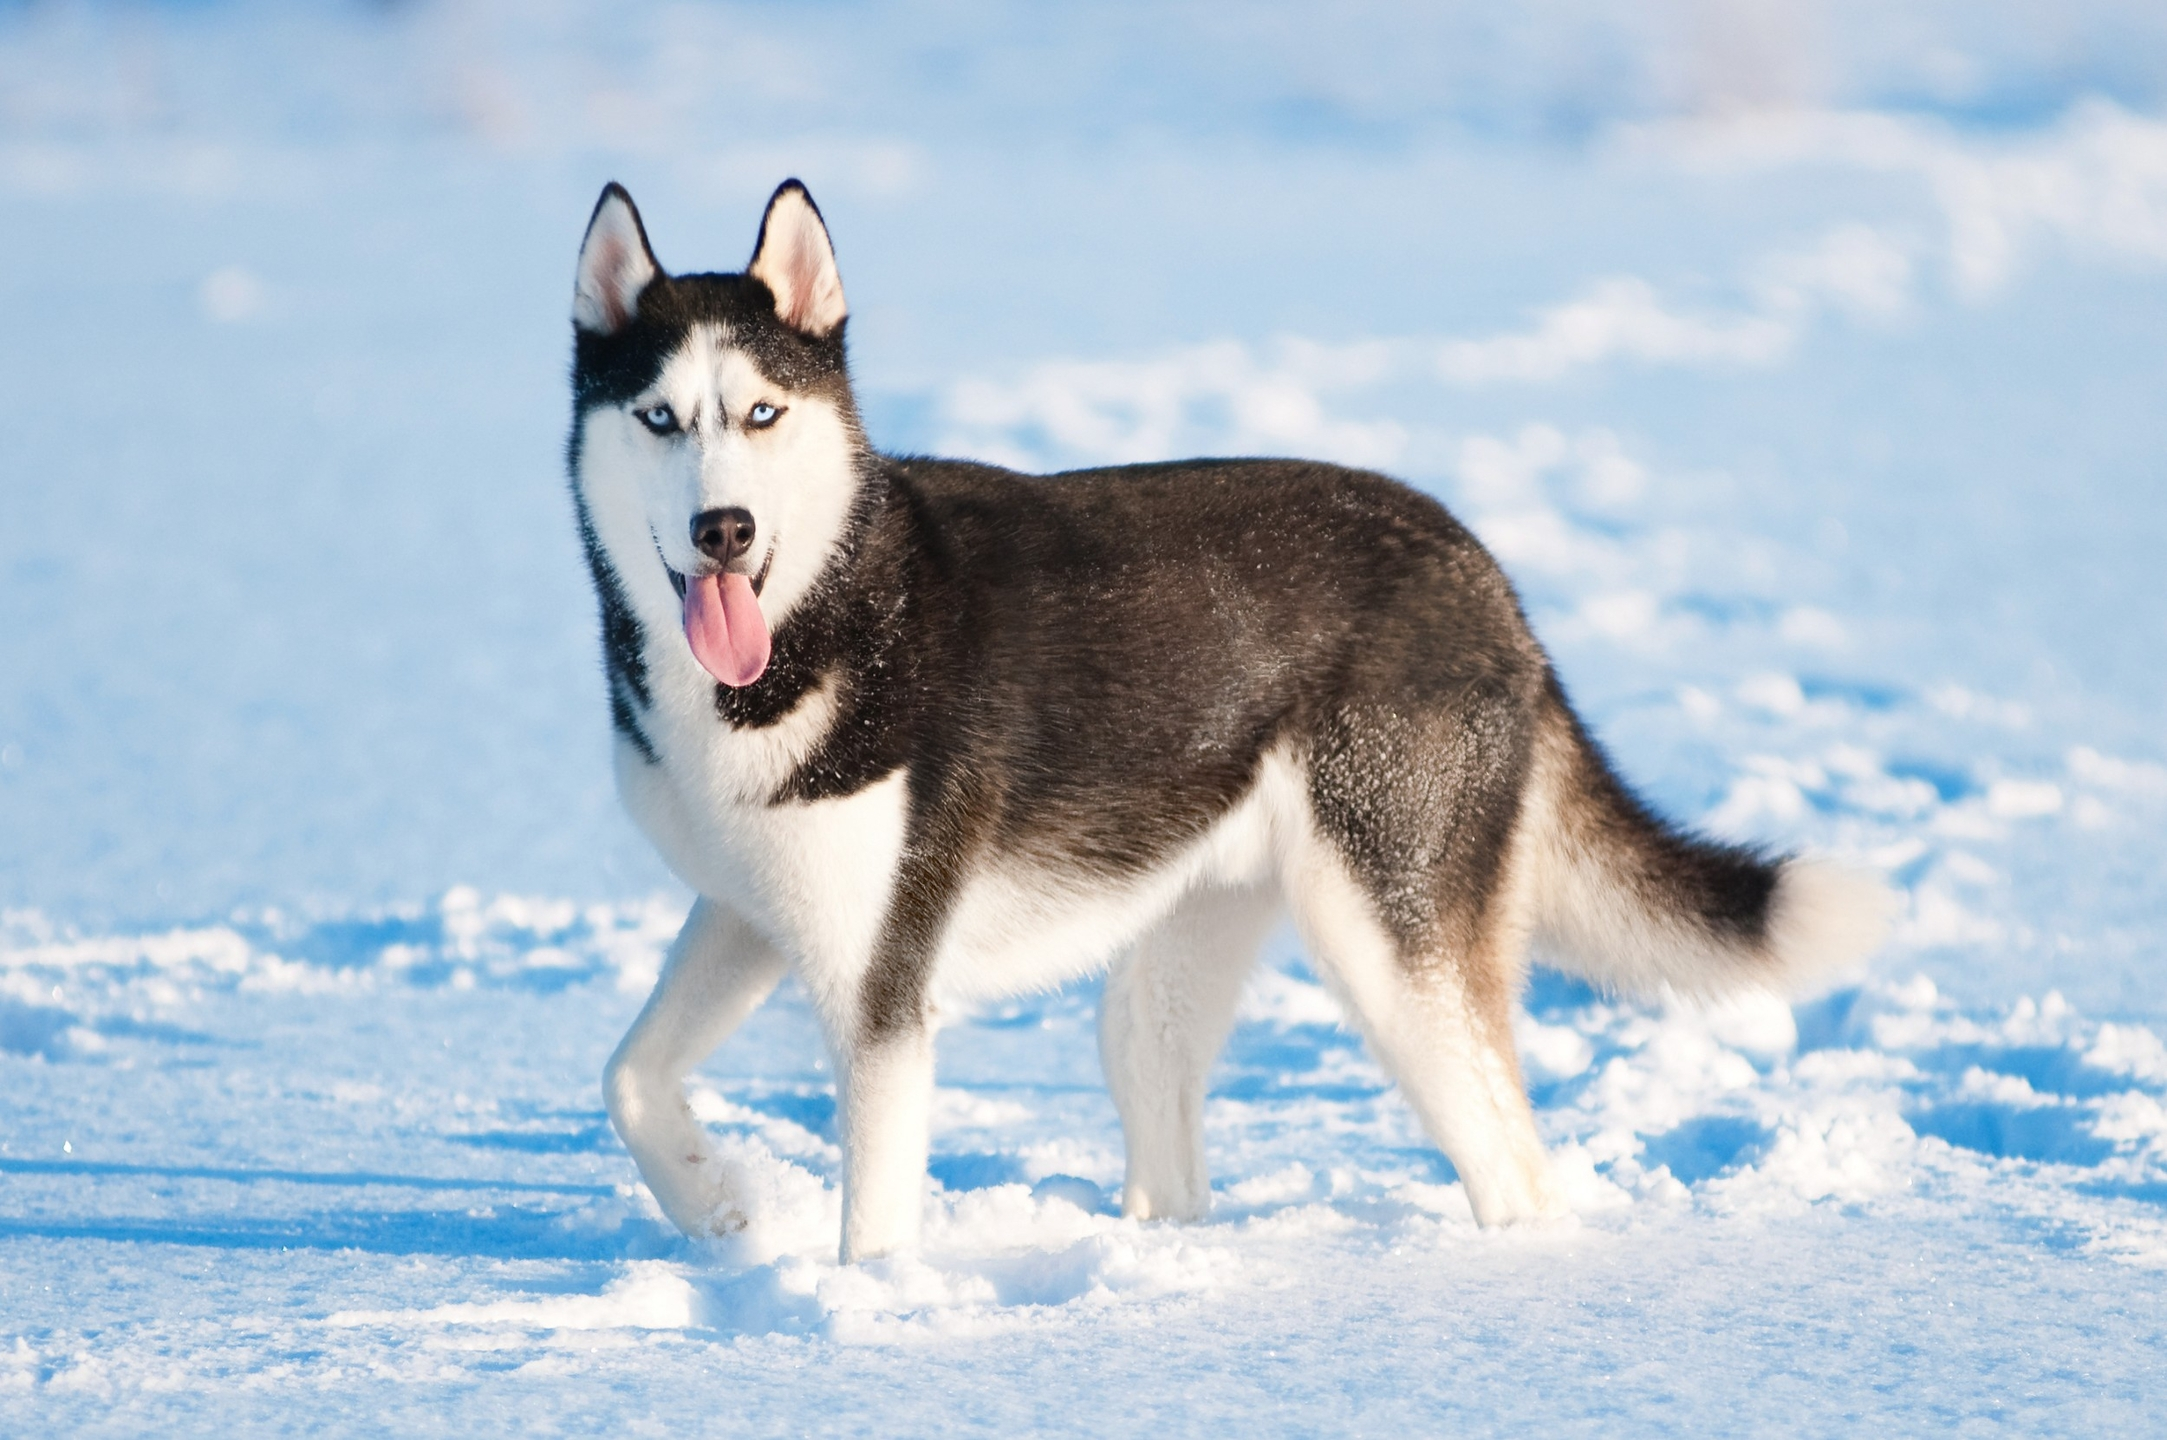 Cachorro Husky Siberiano (@huskysiberianodog) Cover Image